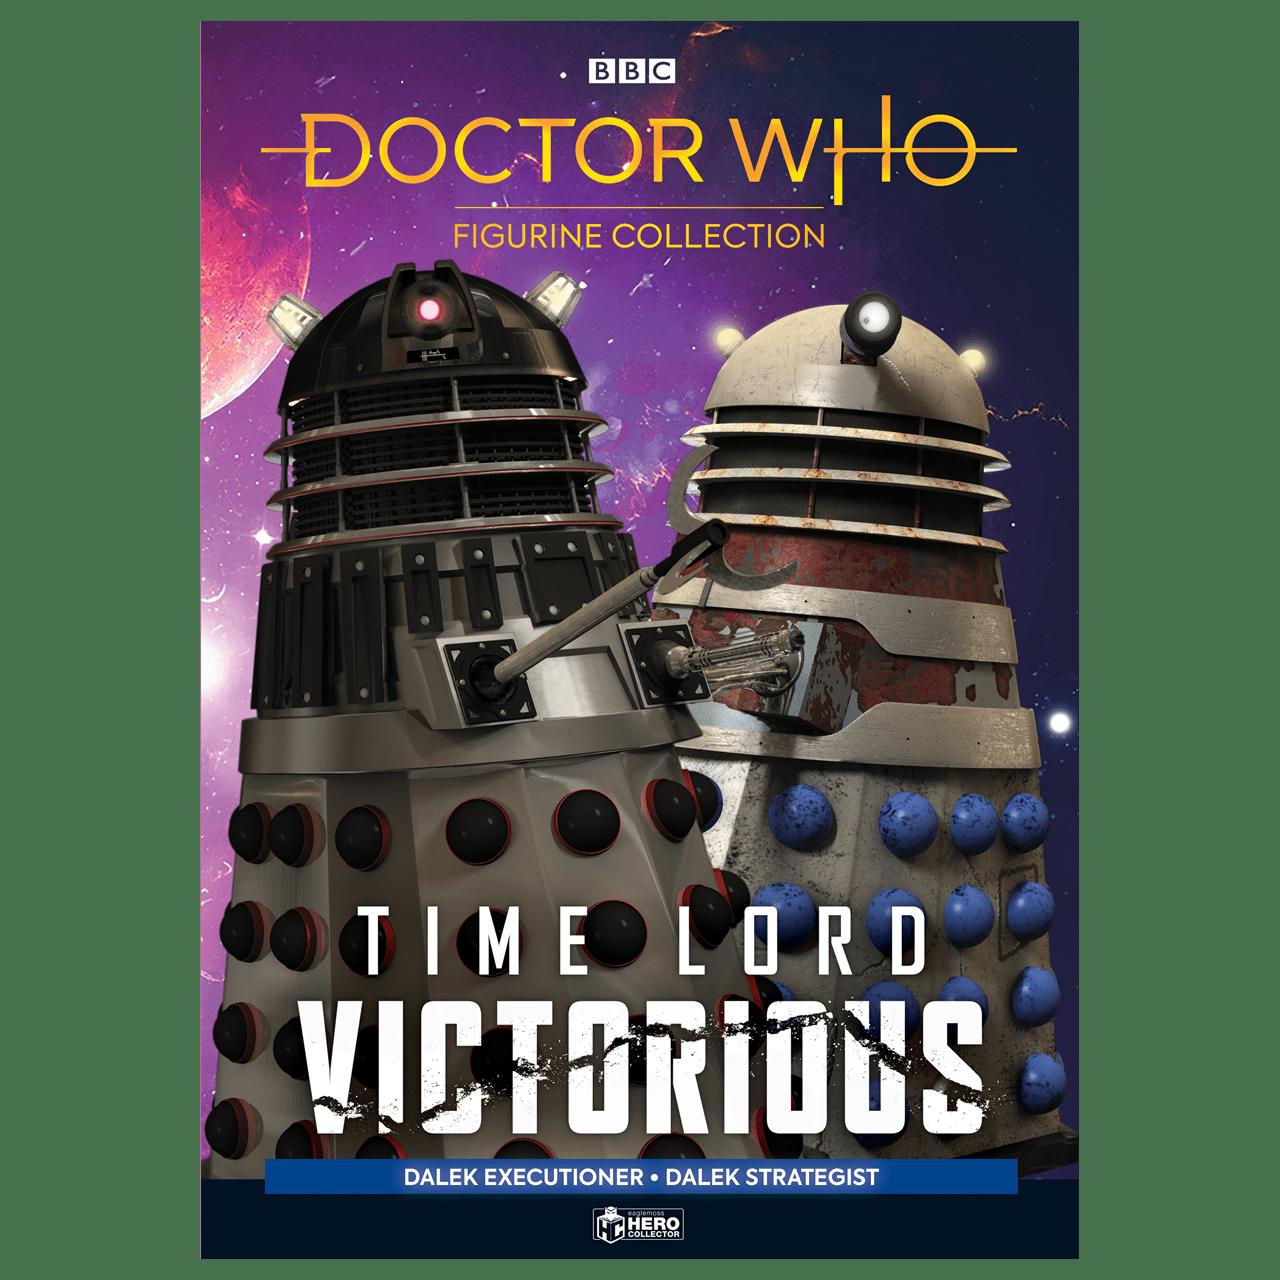 Doctor Who: Dalek Executioner and Dalek Strategist Figurine Set: Hero Collector - 6